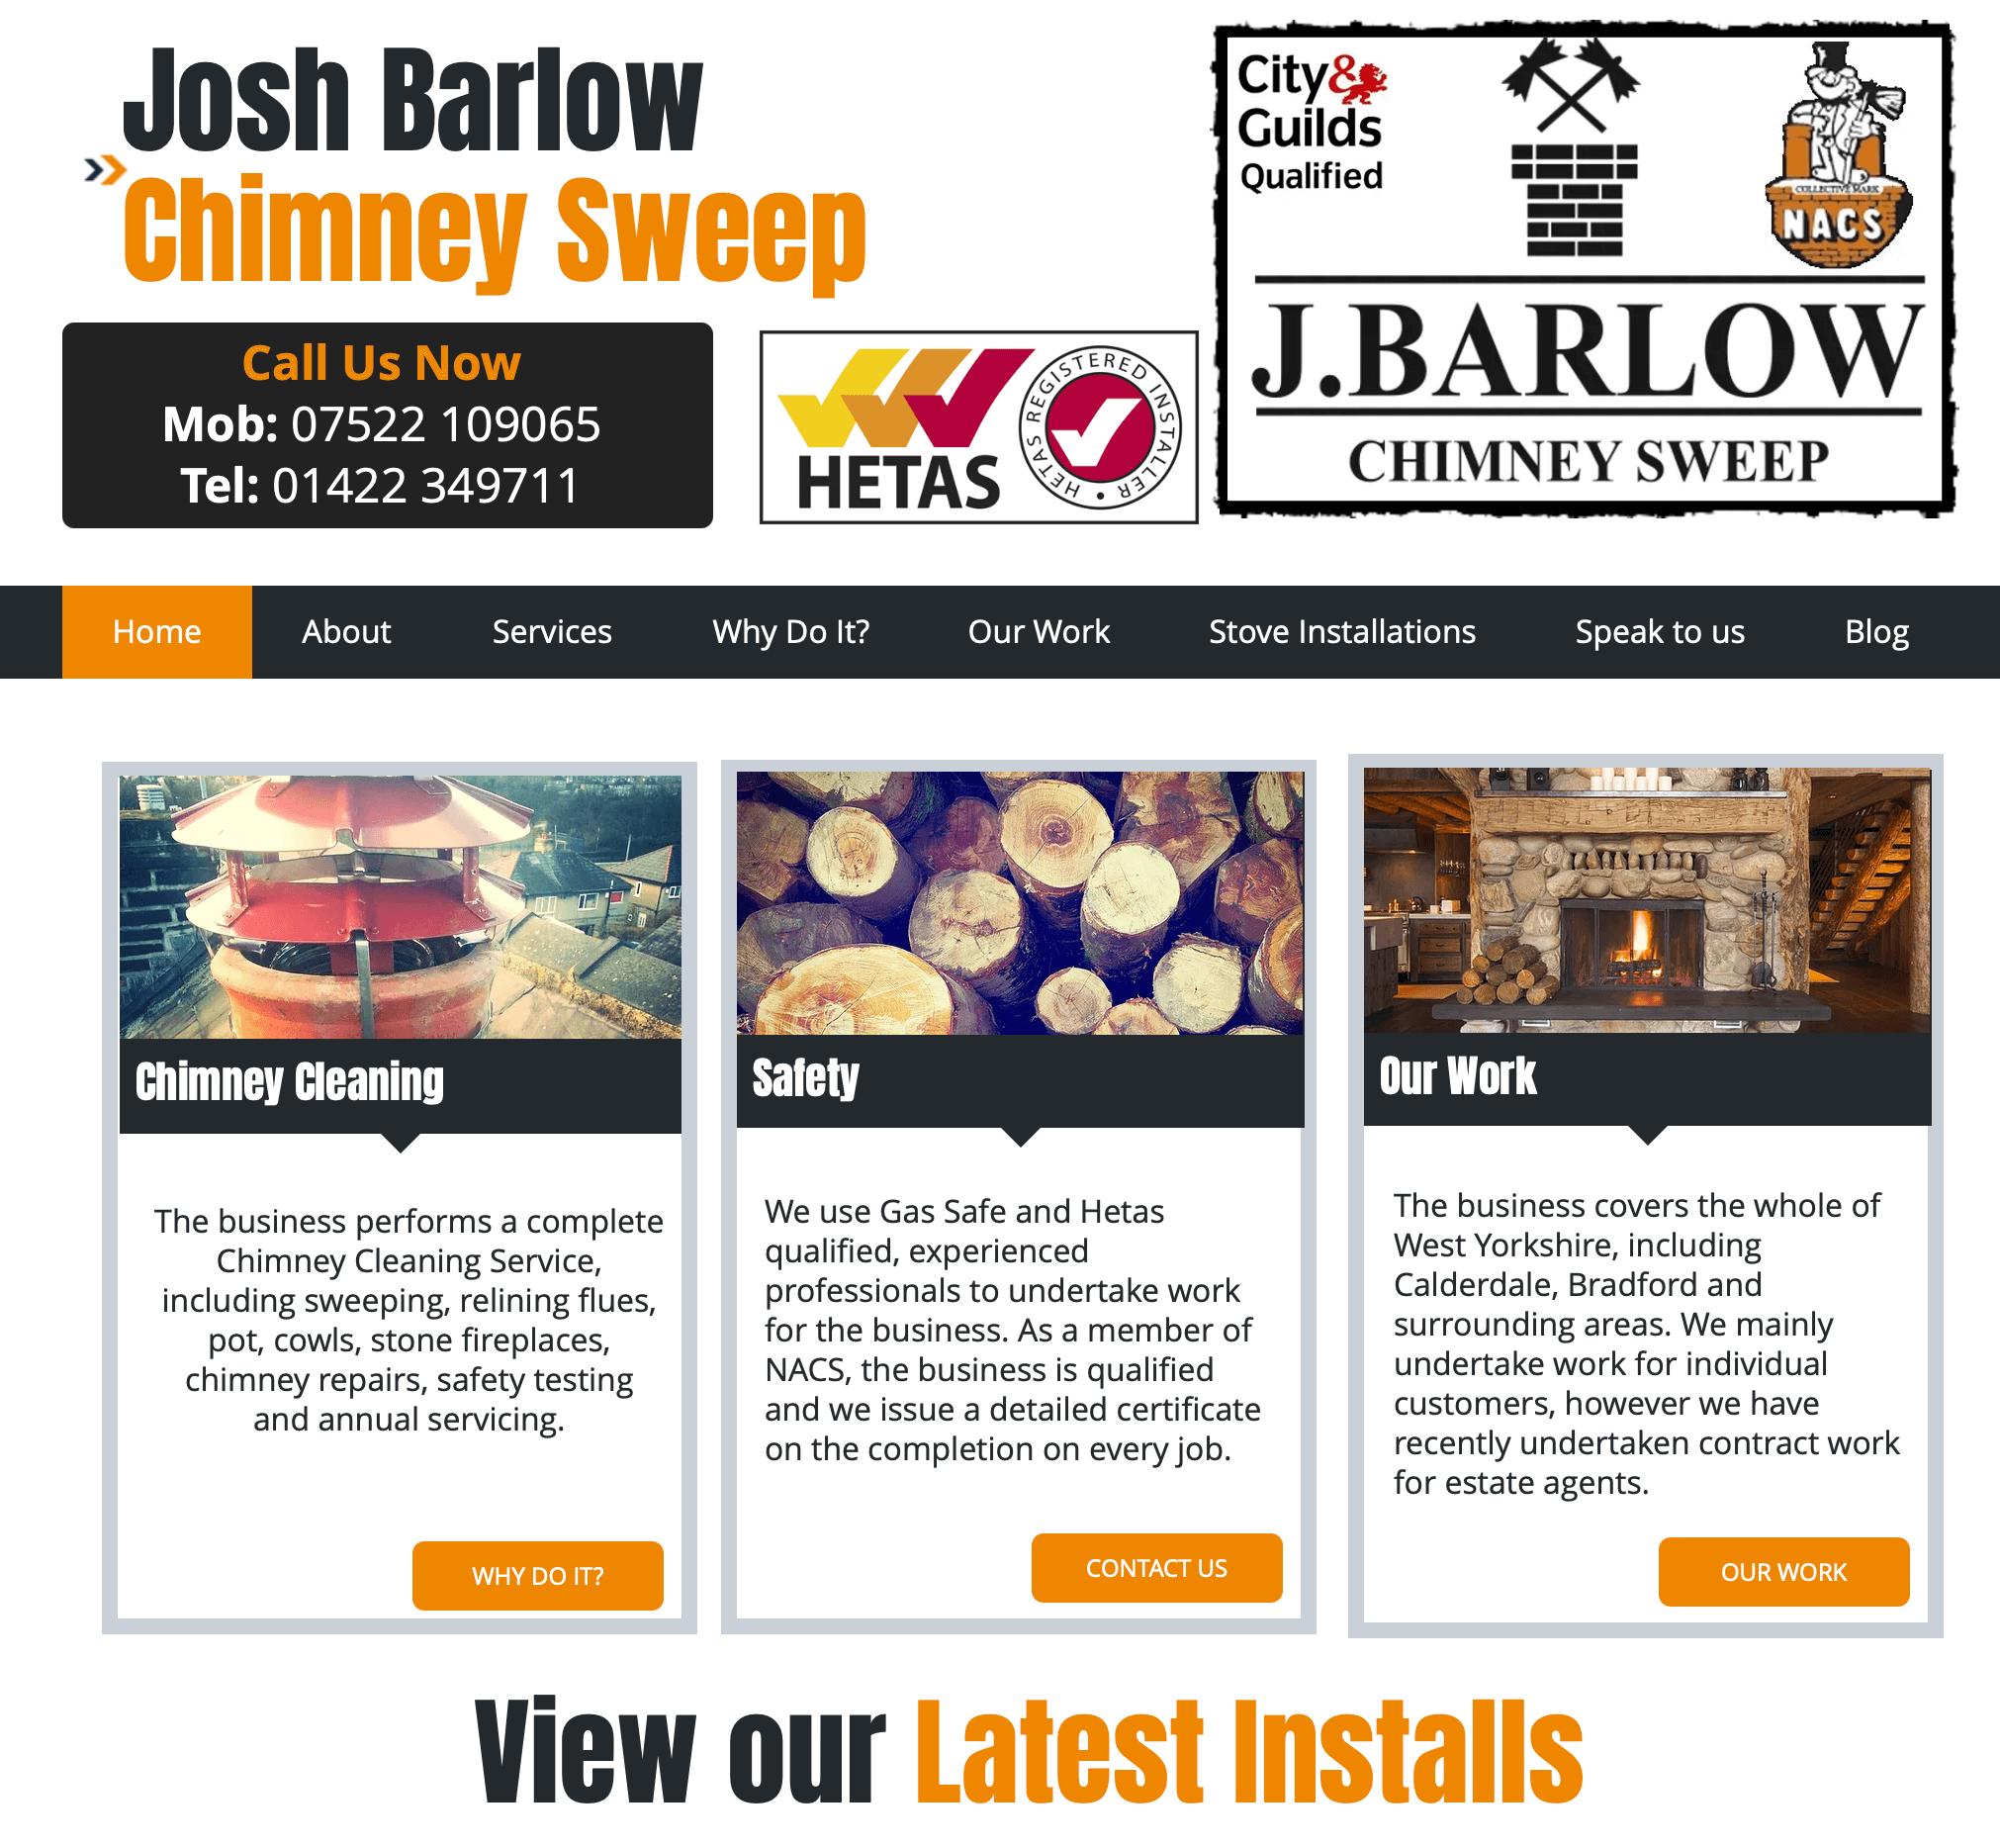 Josh Barlow Chimney Sweep